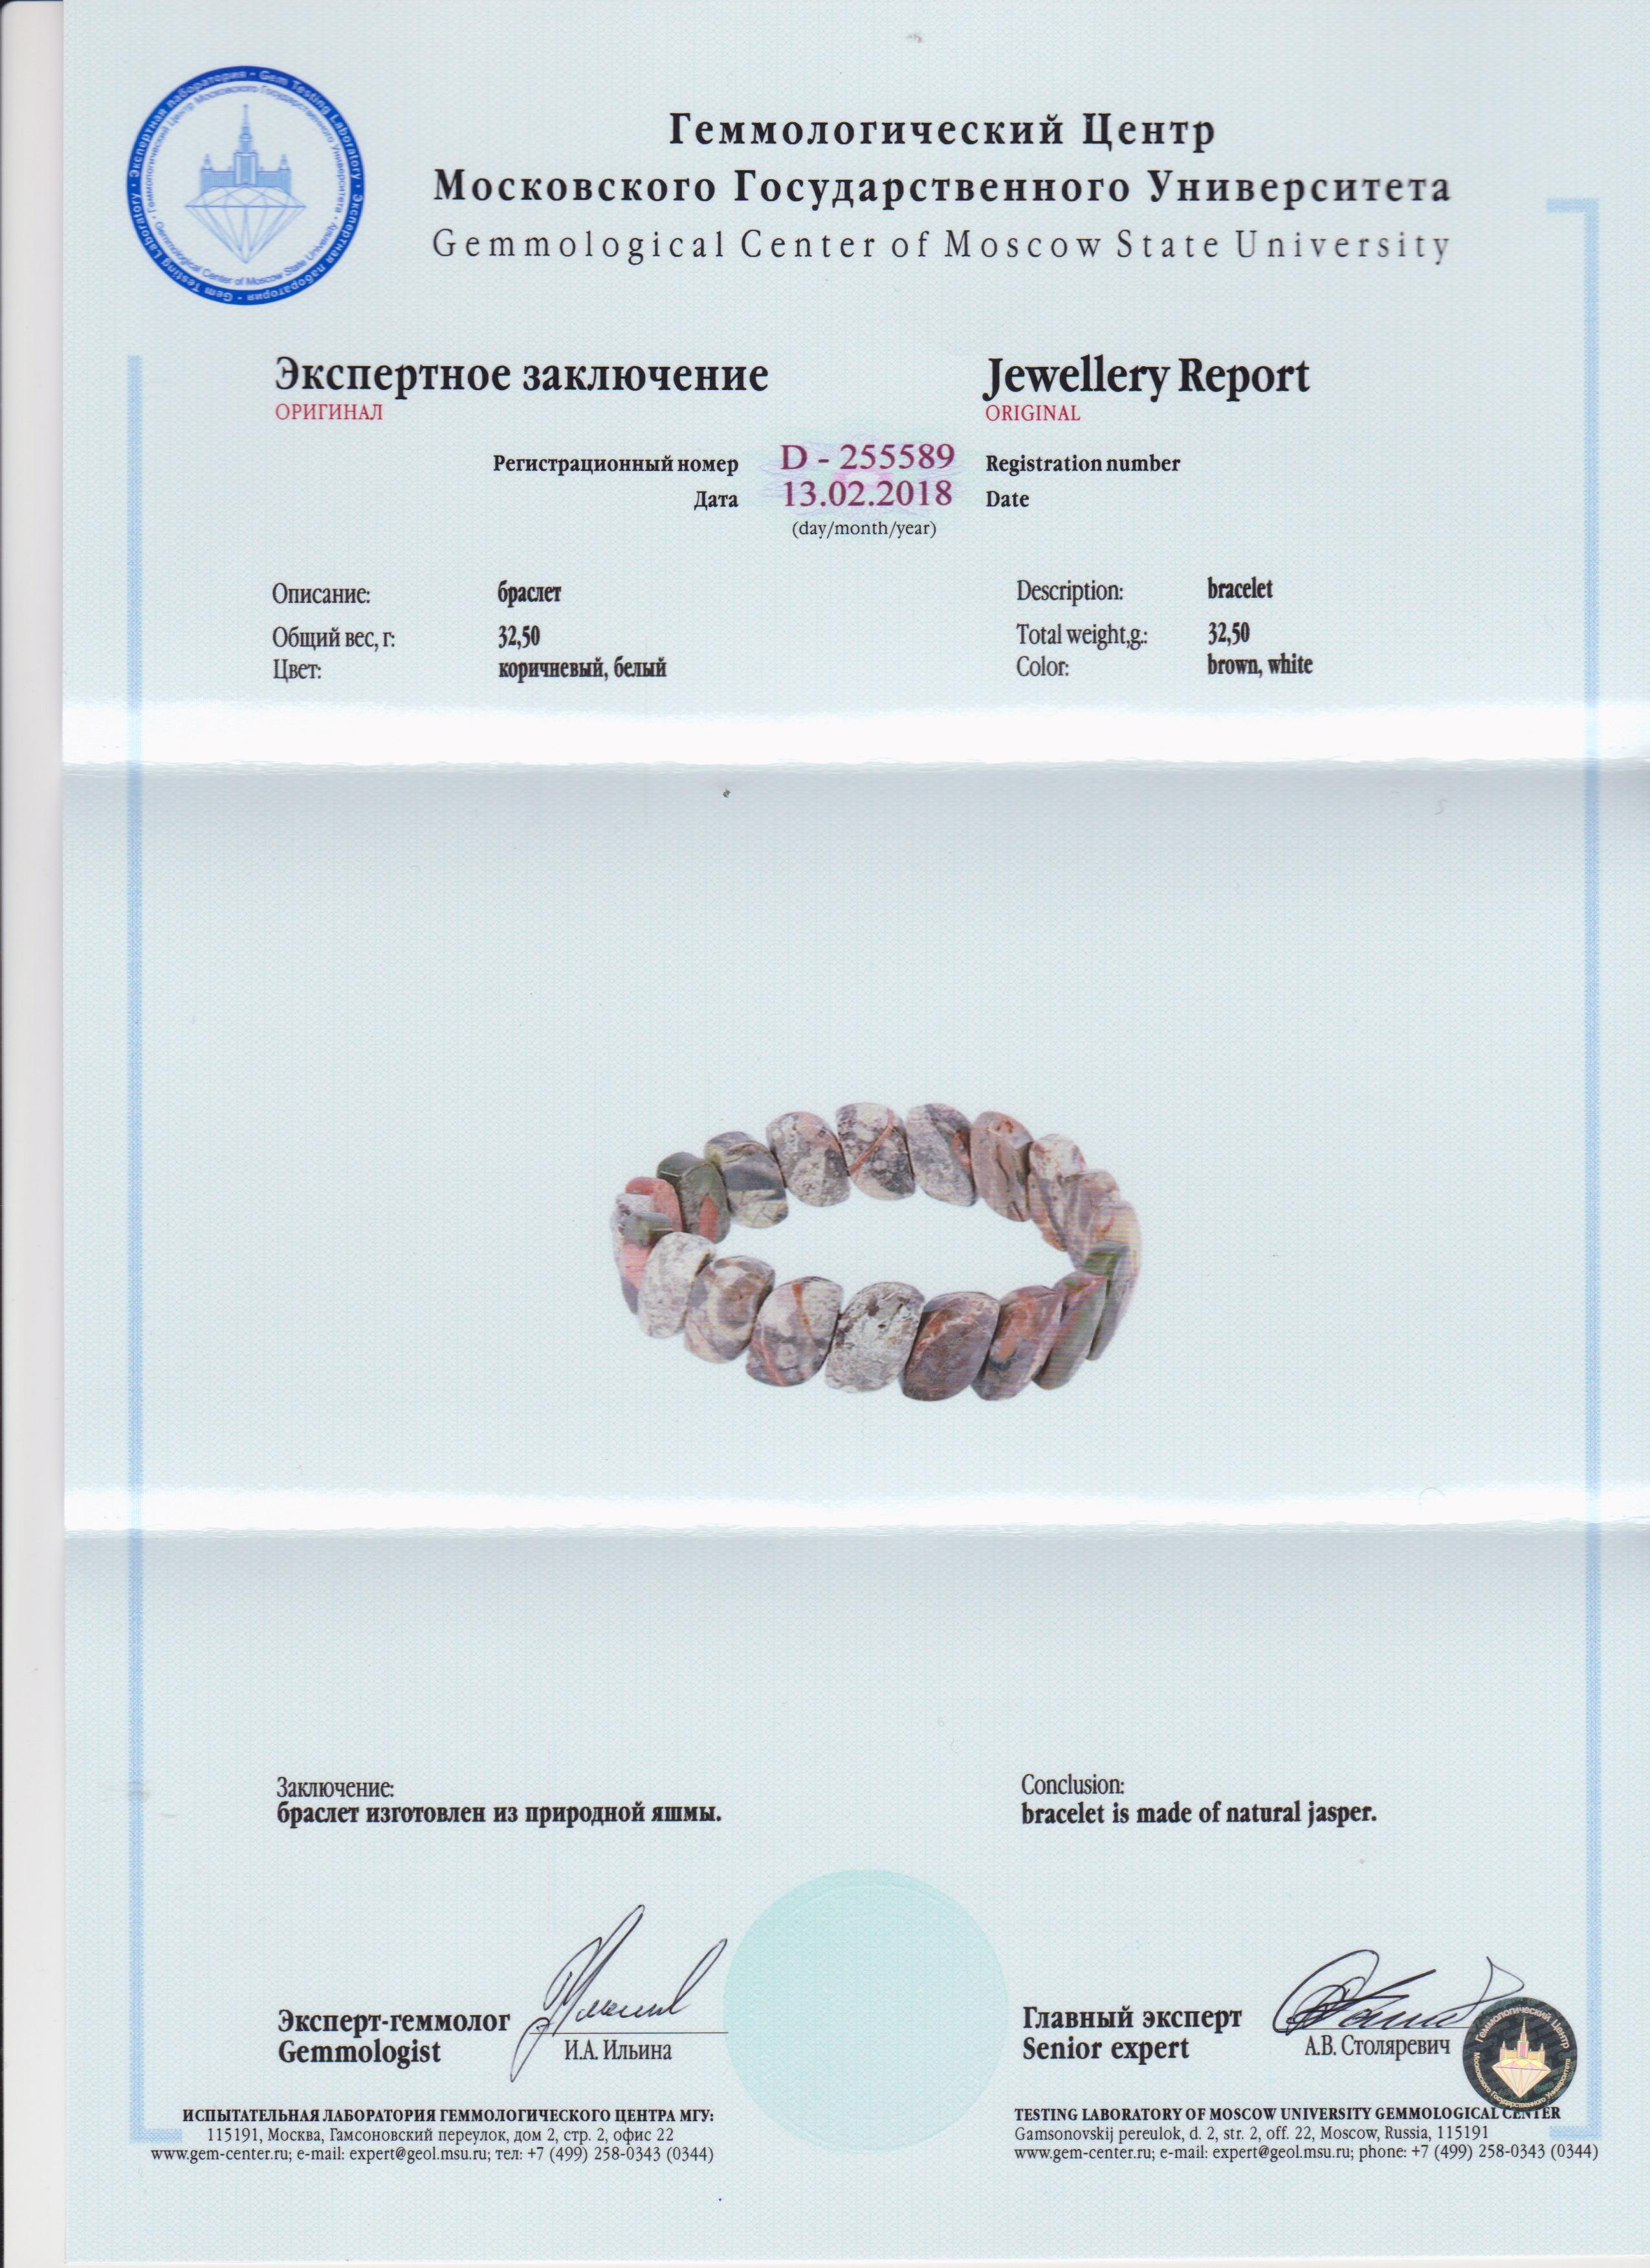 https://mineralmarket.ru/img/certificate/150/1520249378.jpg